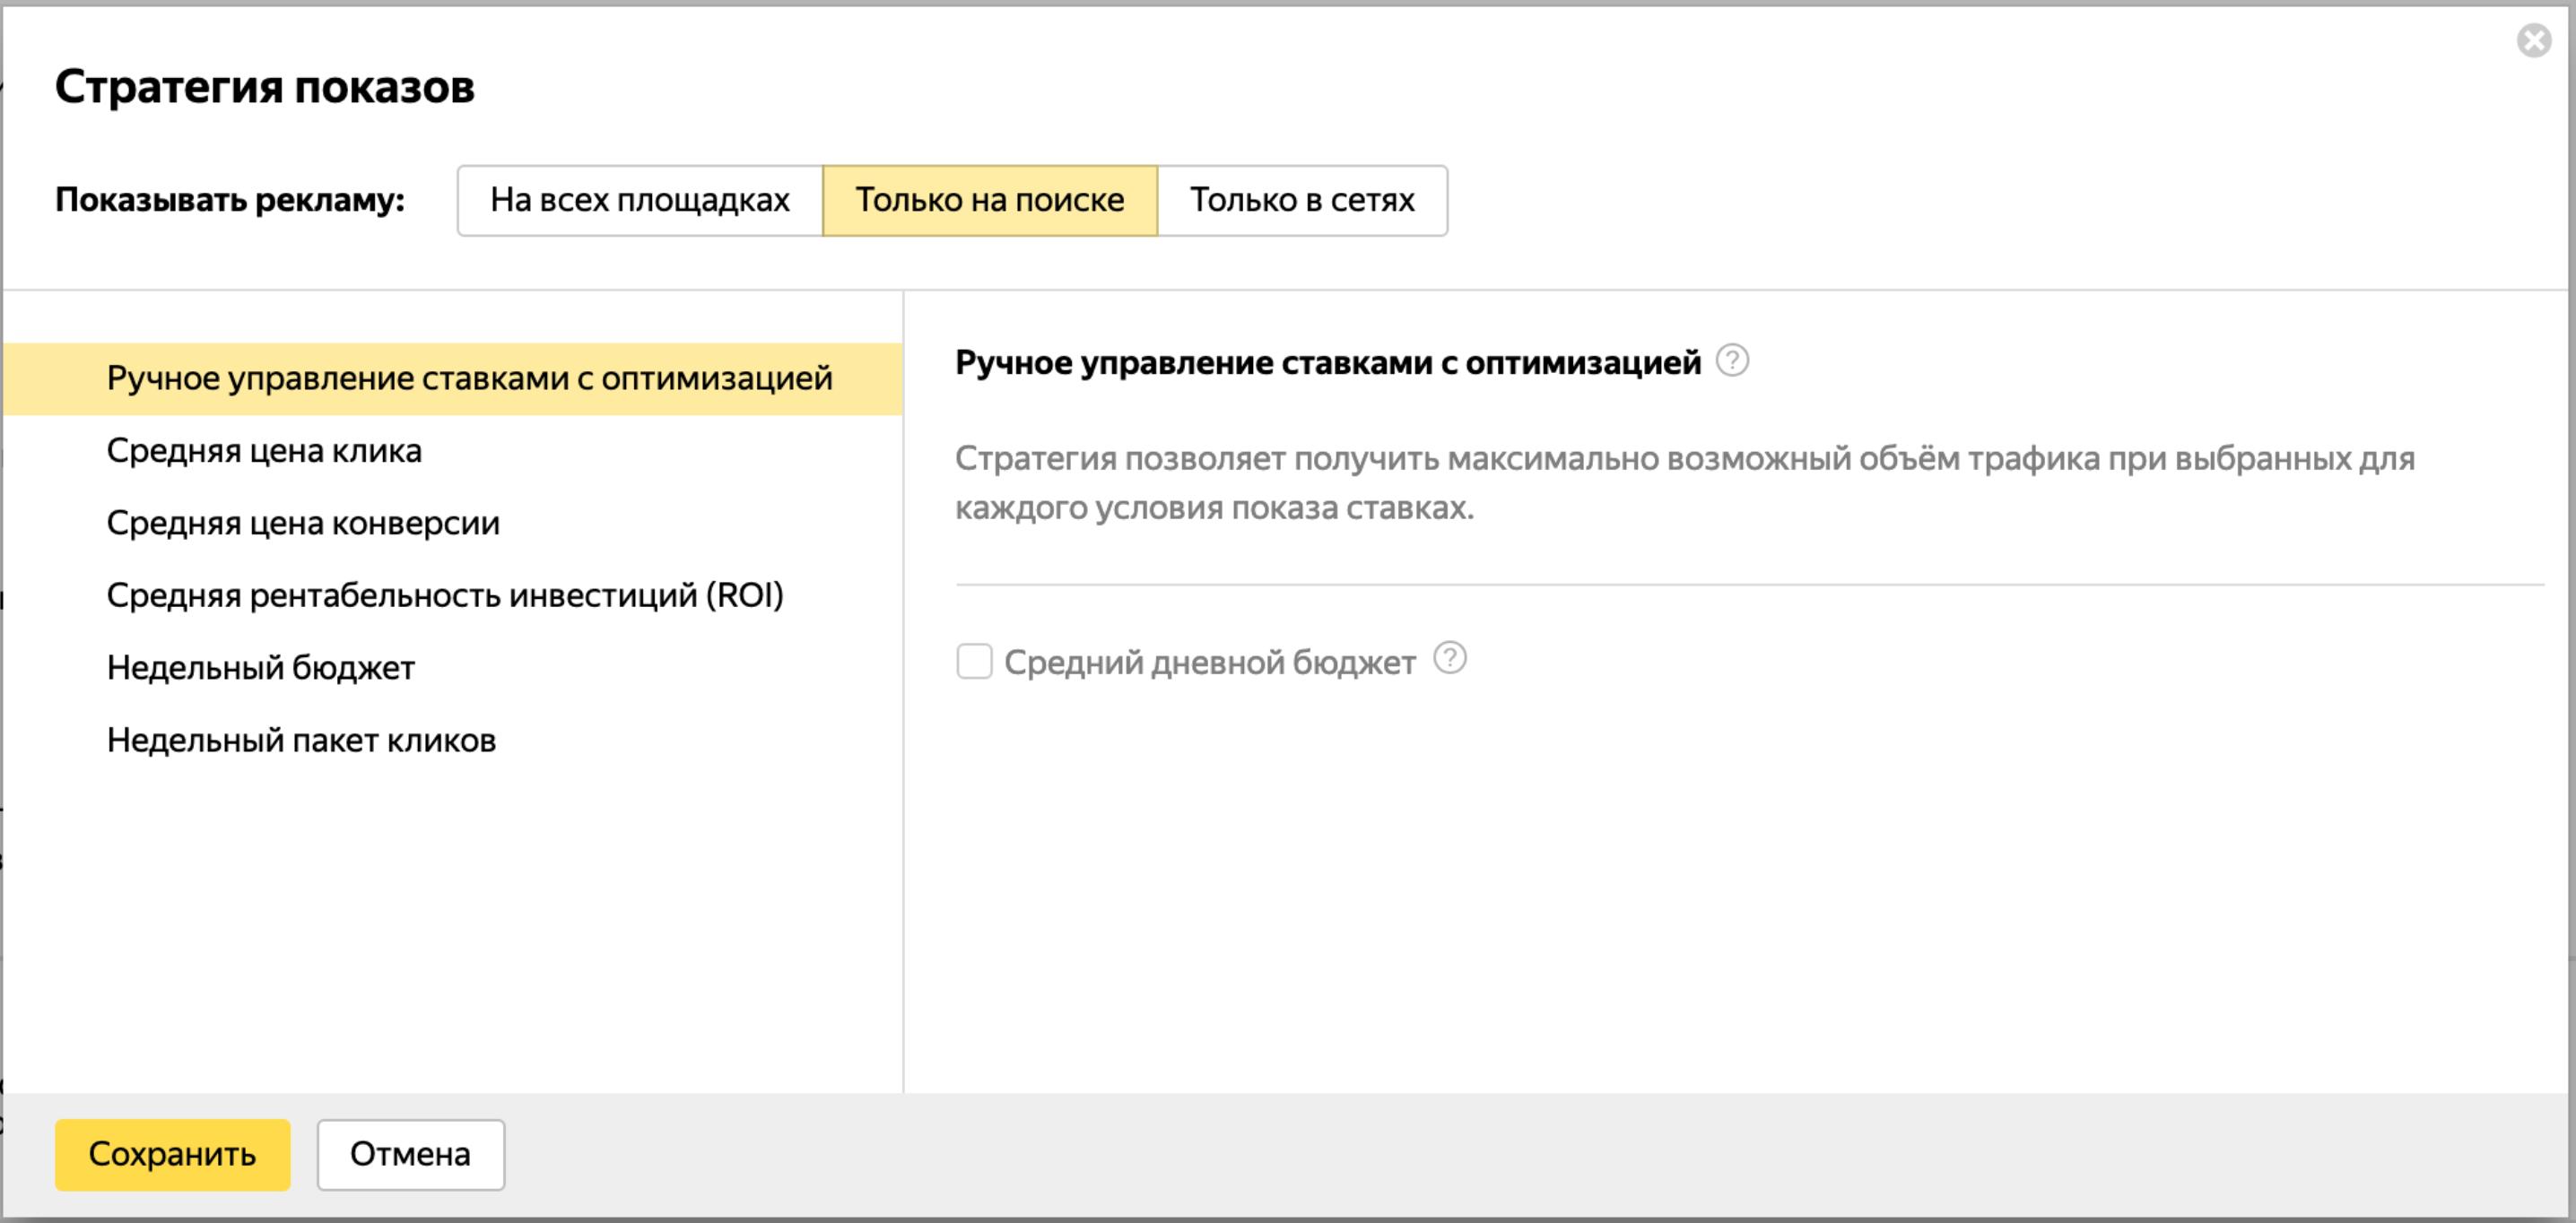 Яндекс.Директ вводит оптимизацию ставок на поисковом трафике